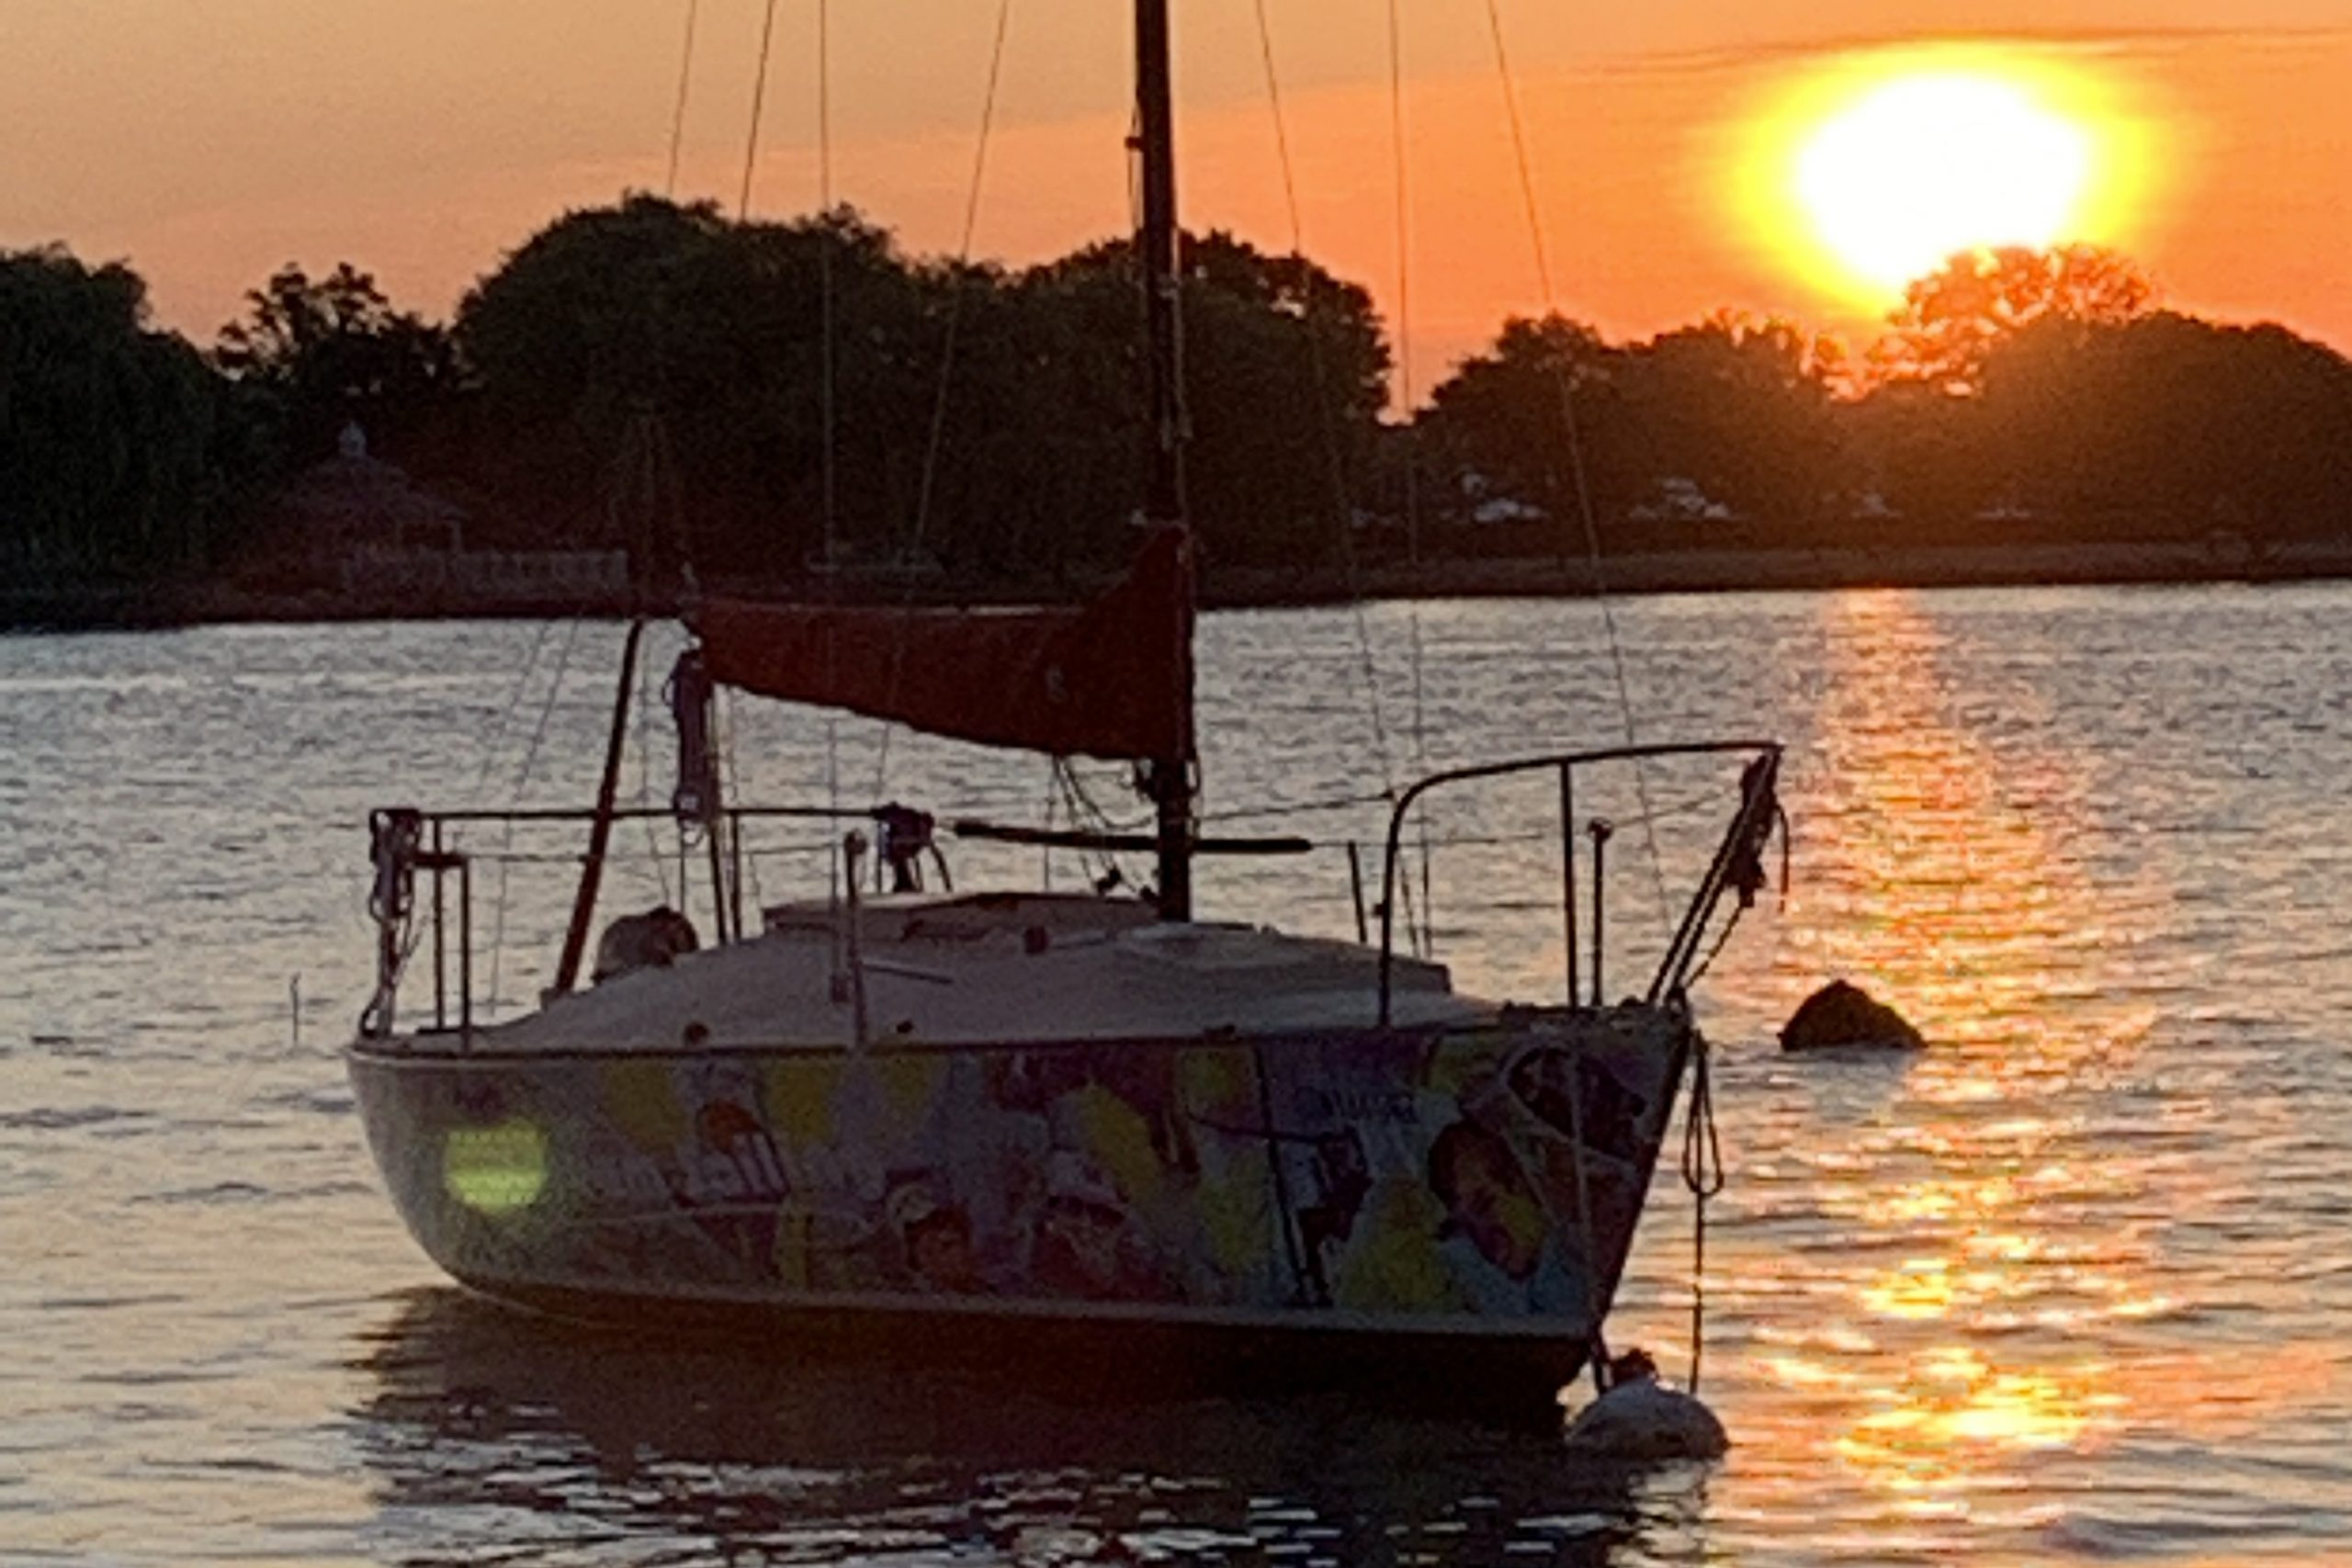 daydream sailing canandaigua boat at sunset